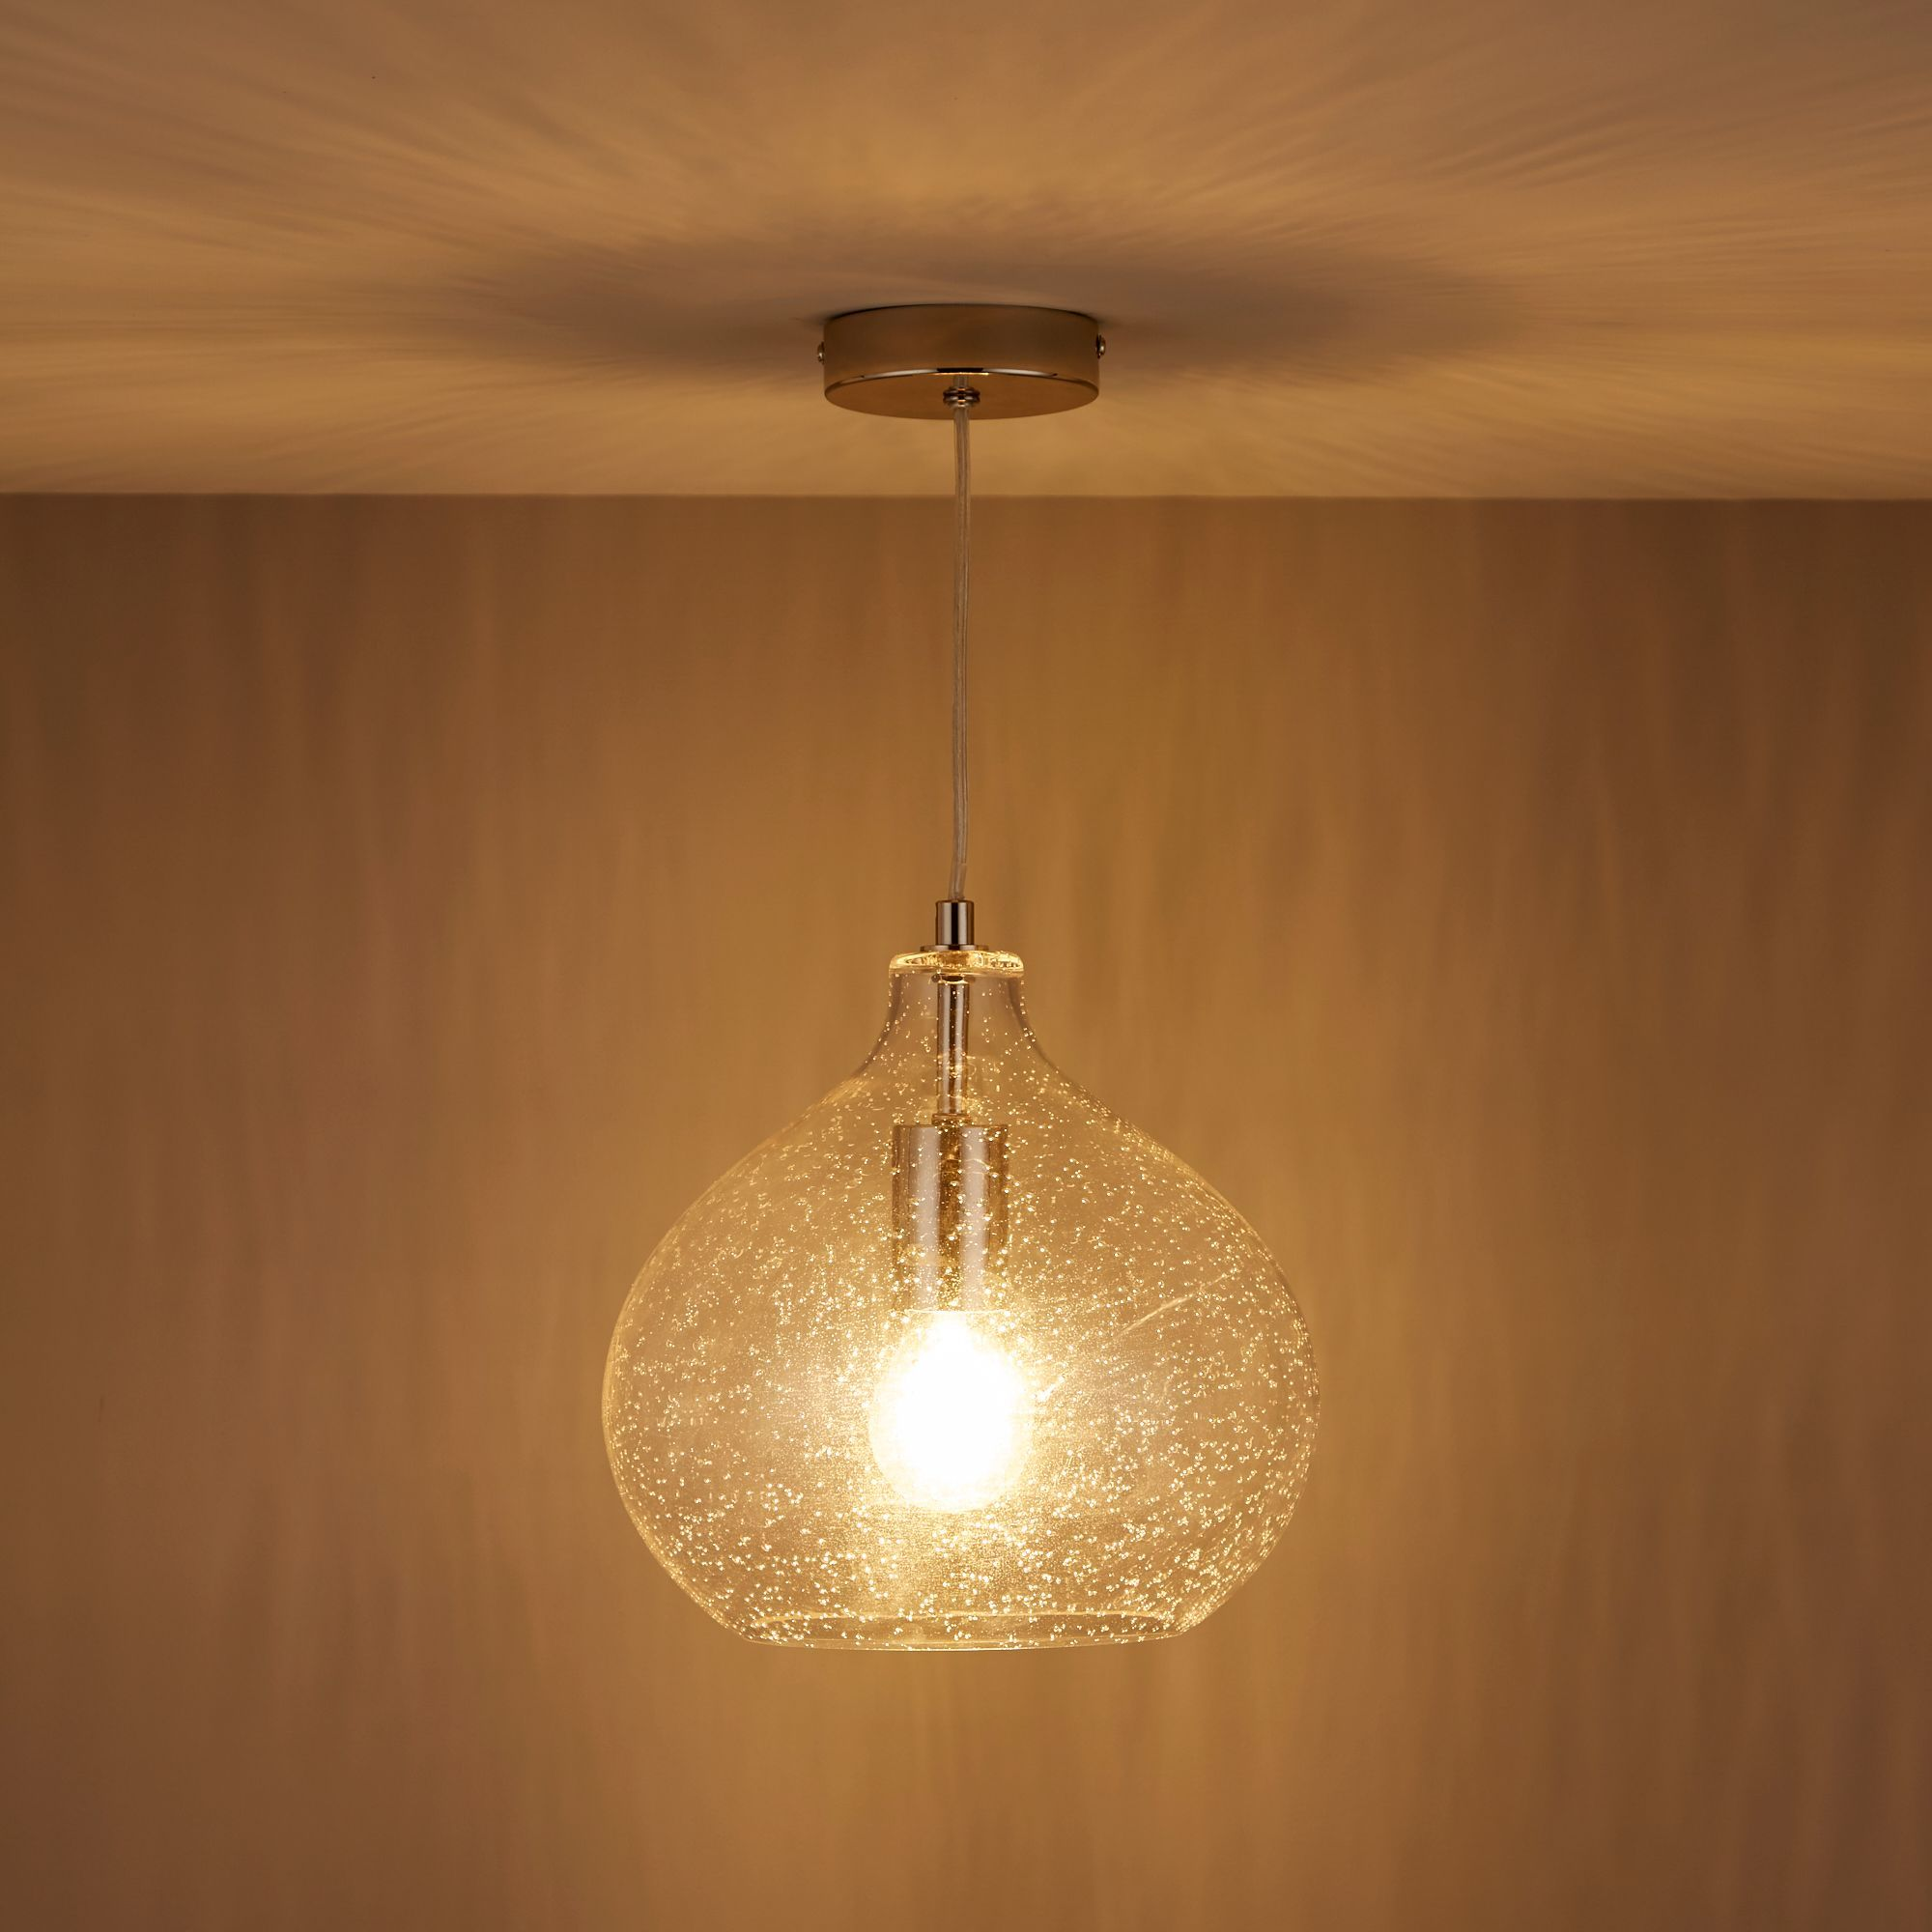 Hester bubble glass pendant ceiling light glass pendants hester bubble glass pendant ceiling light aloadofball Choice Image